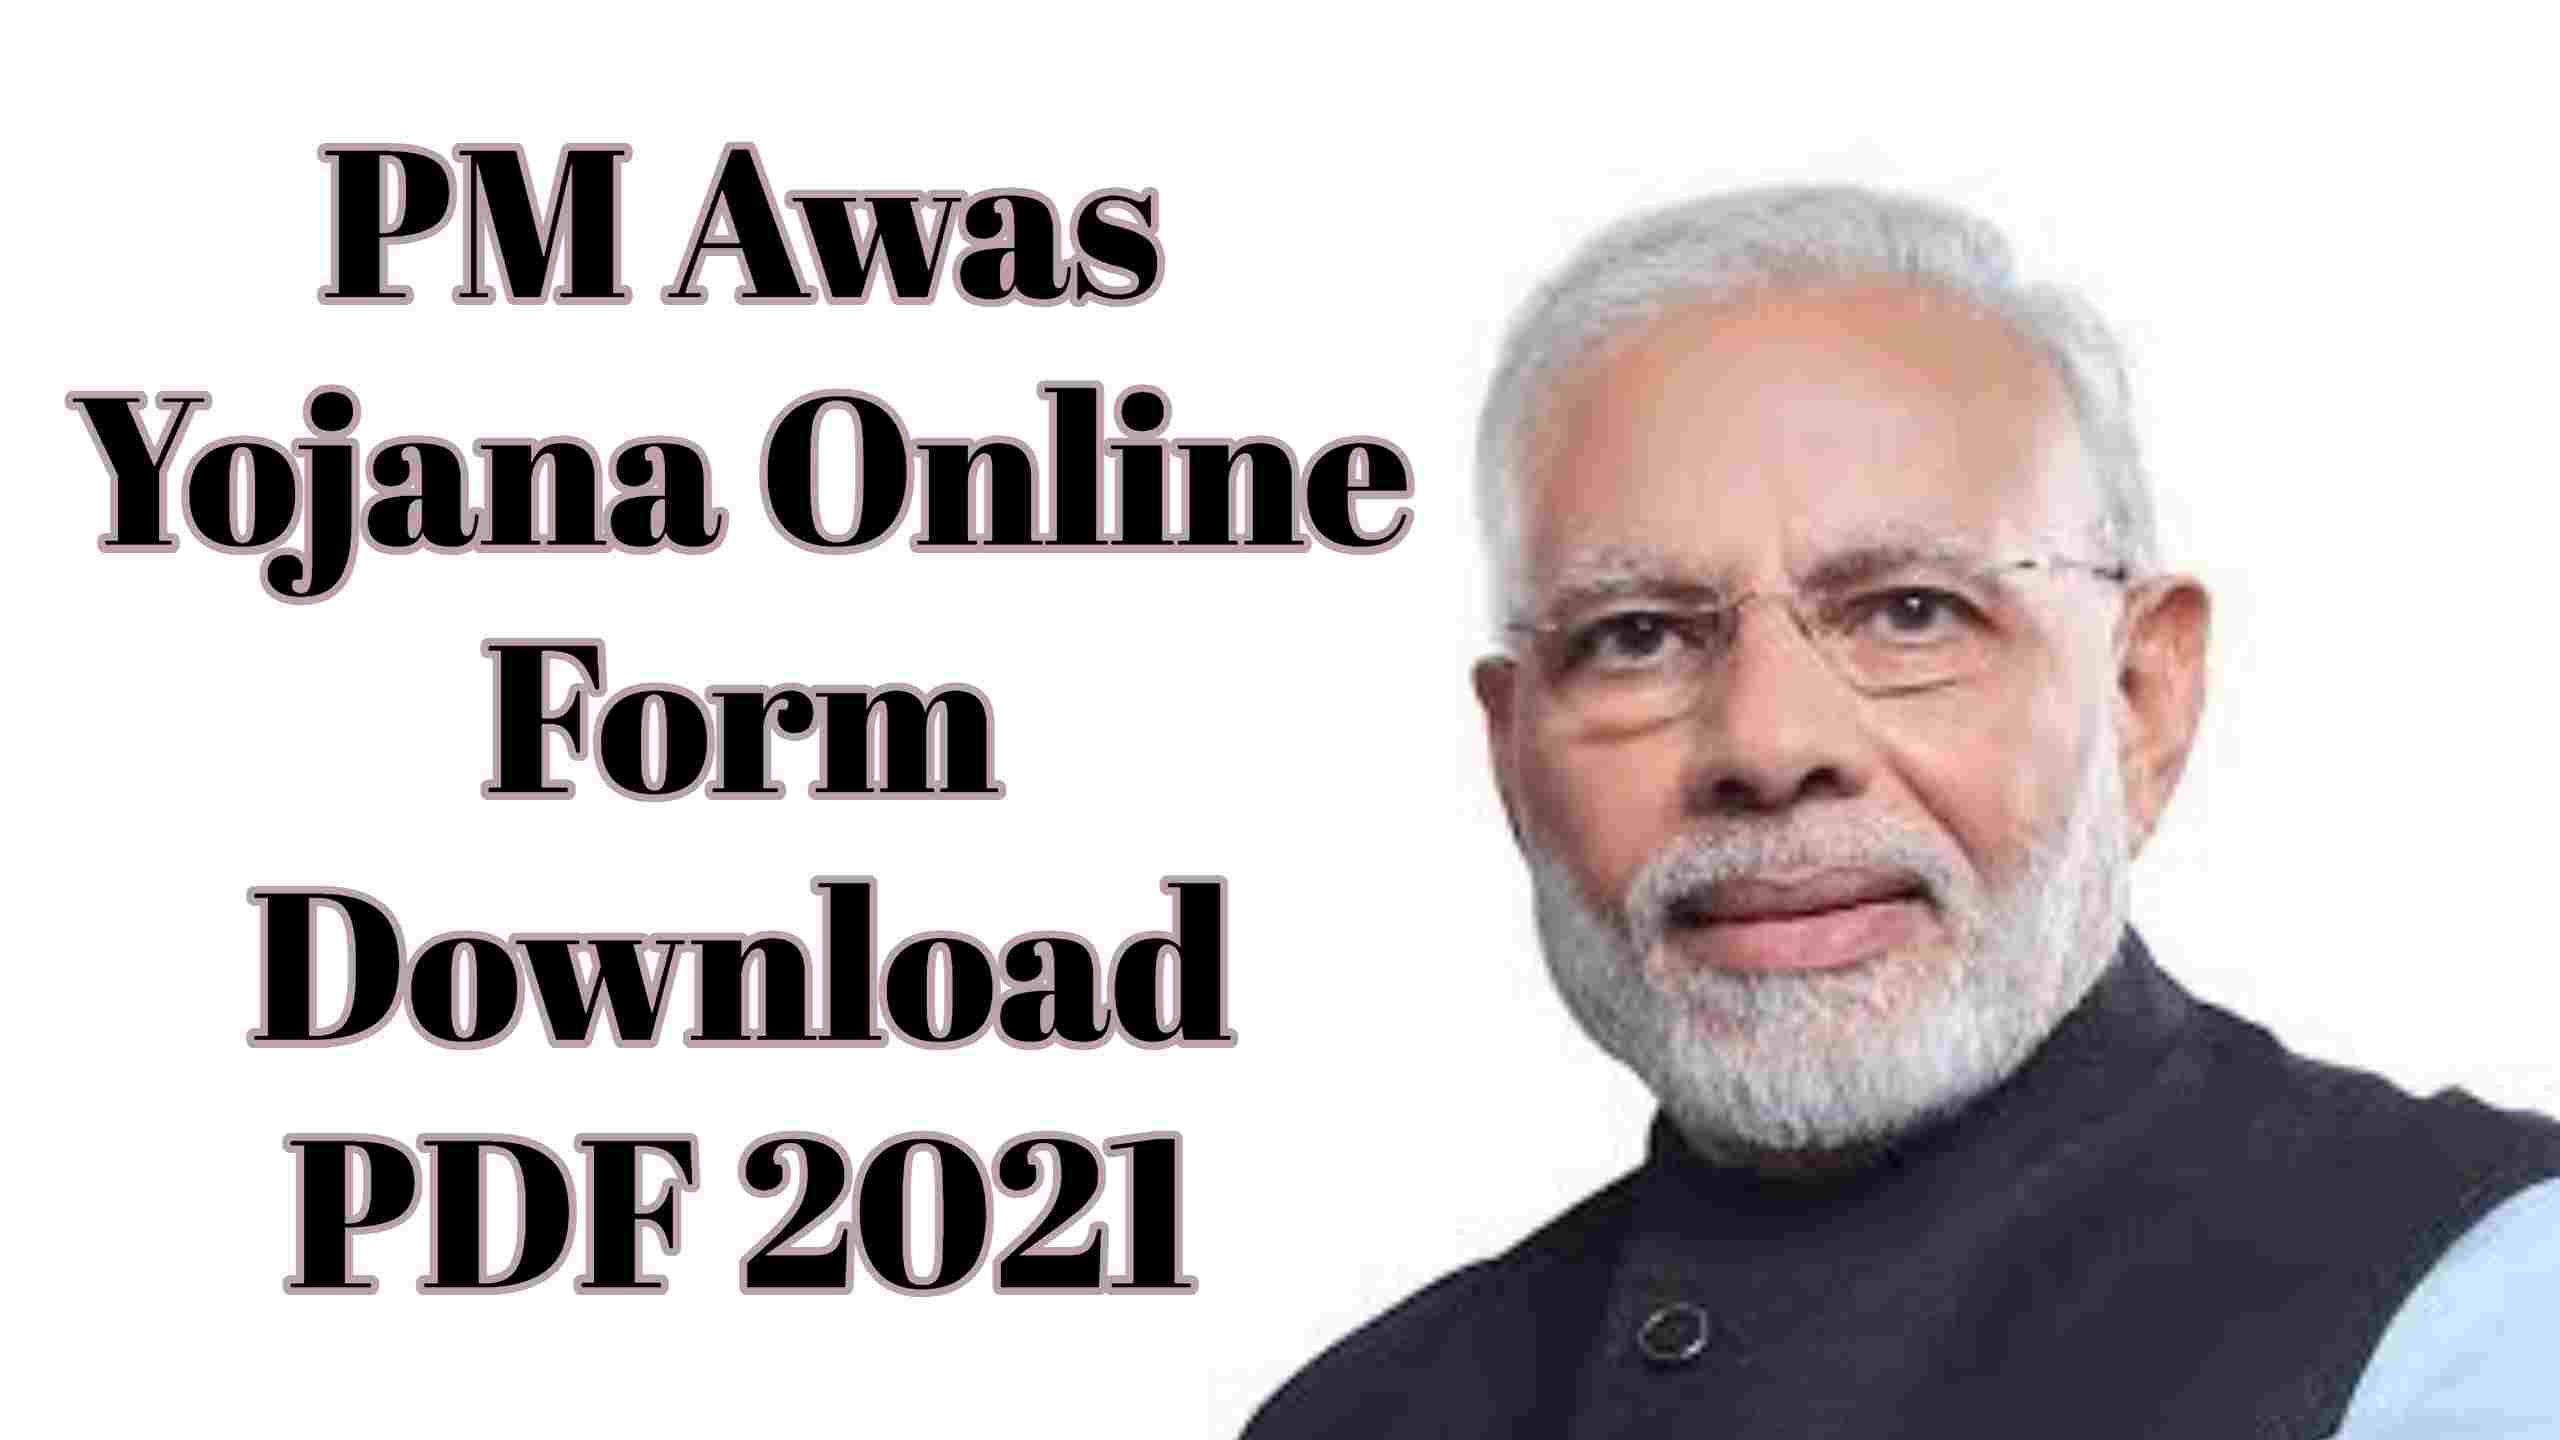 PM Awas Yojana Online Form Download PDF 2021